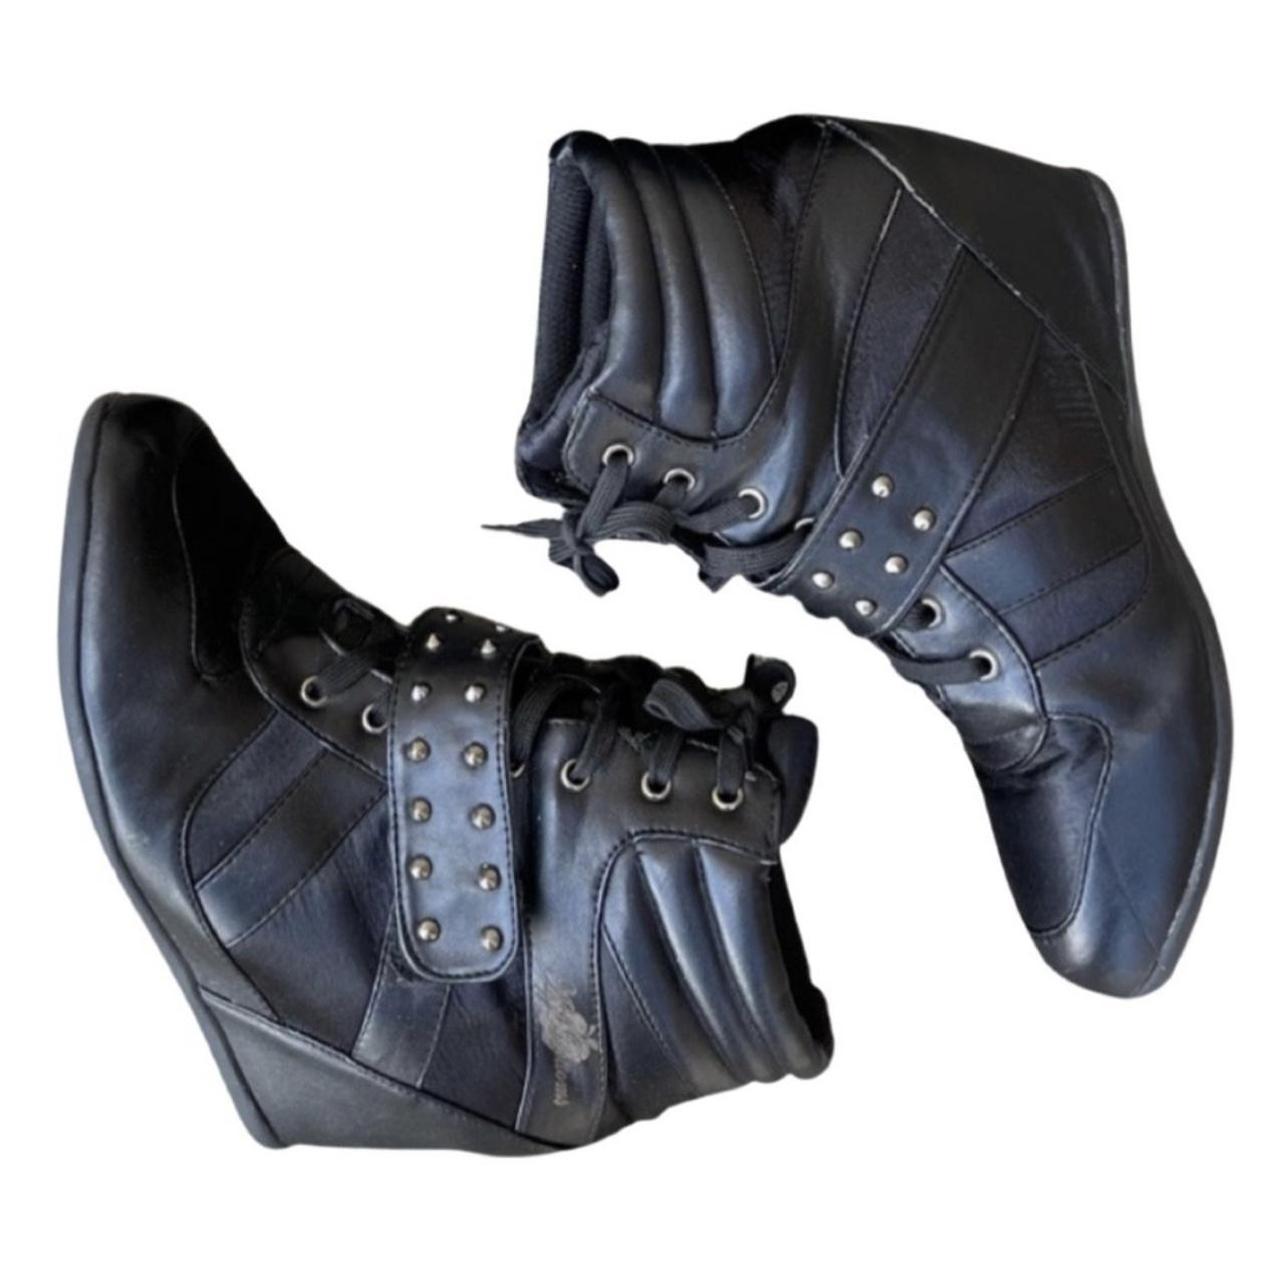 Product Image 1 - Black Apple Bottom Sneaker Wedge  Edgy